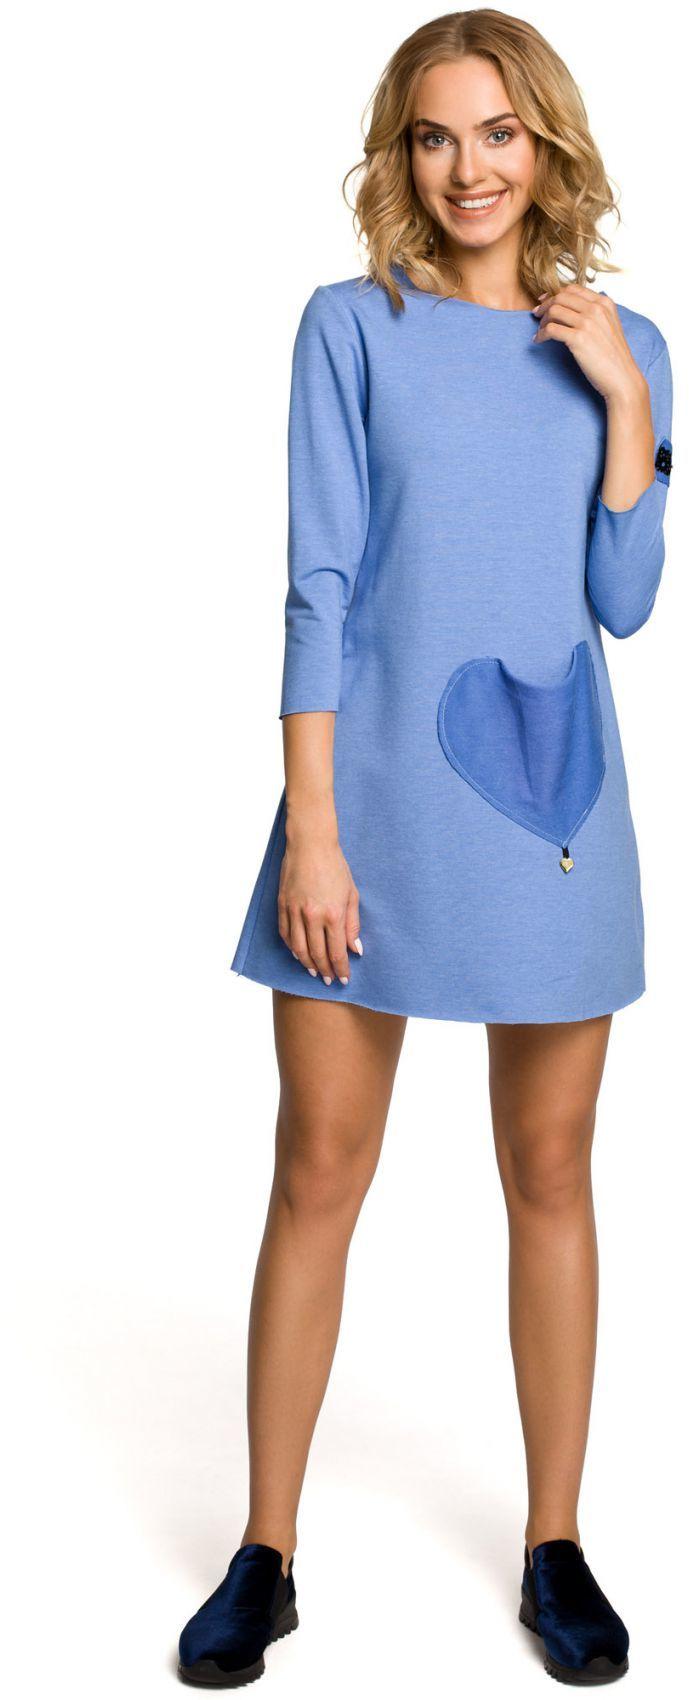 M053 Mini sukienka - tunika z dzianiny - niebieska